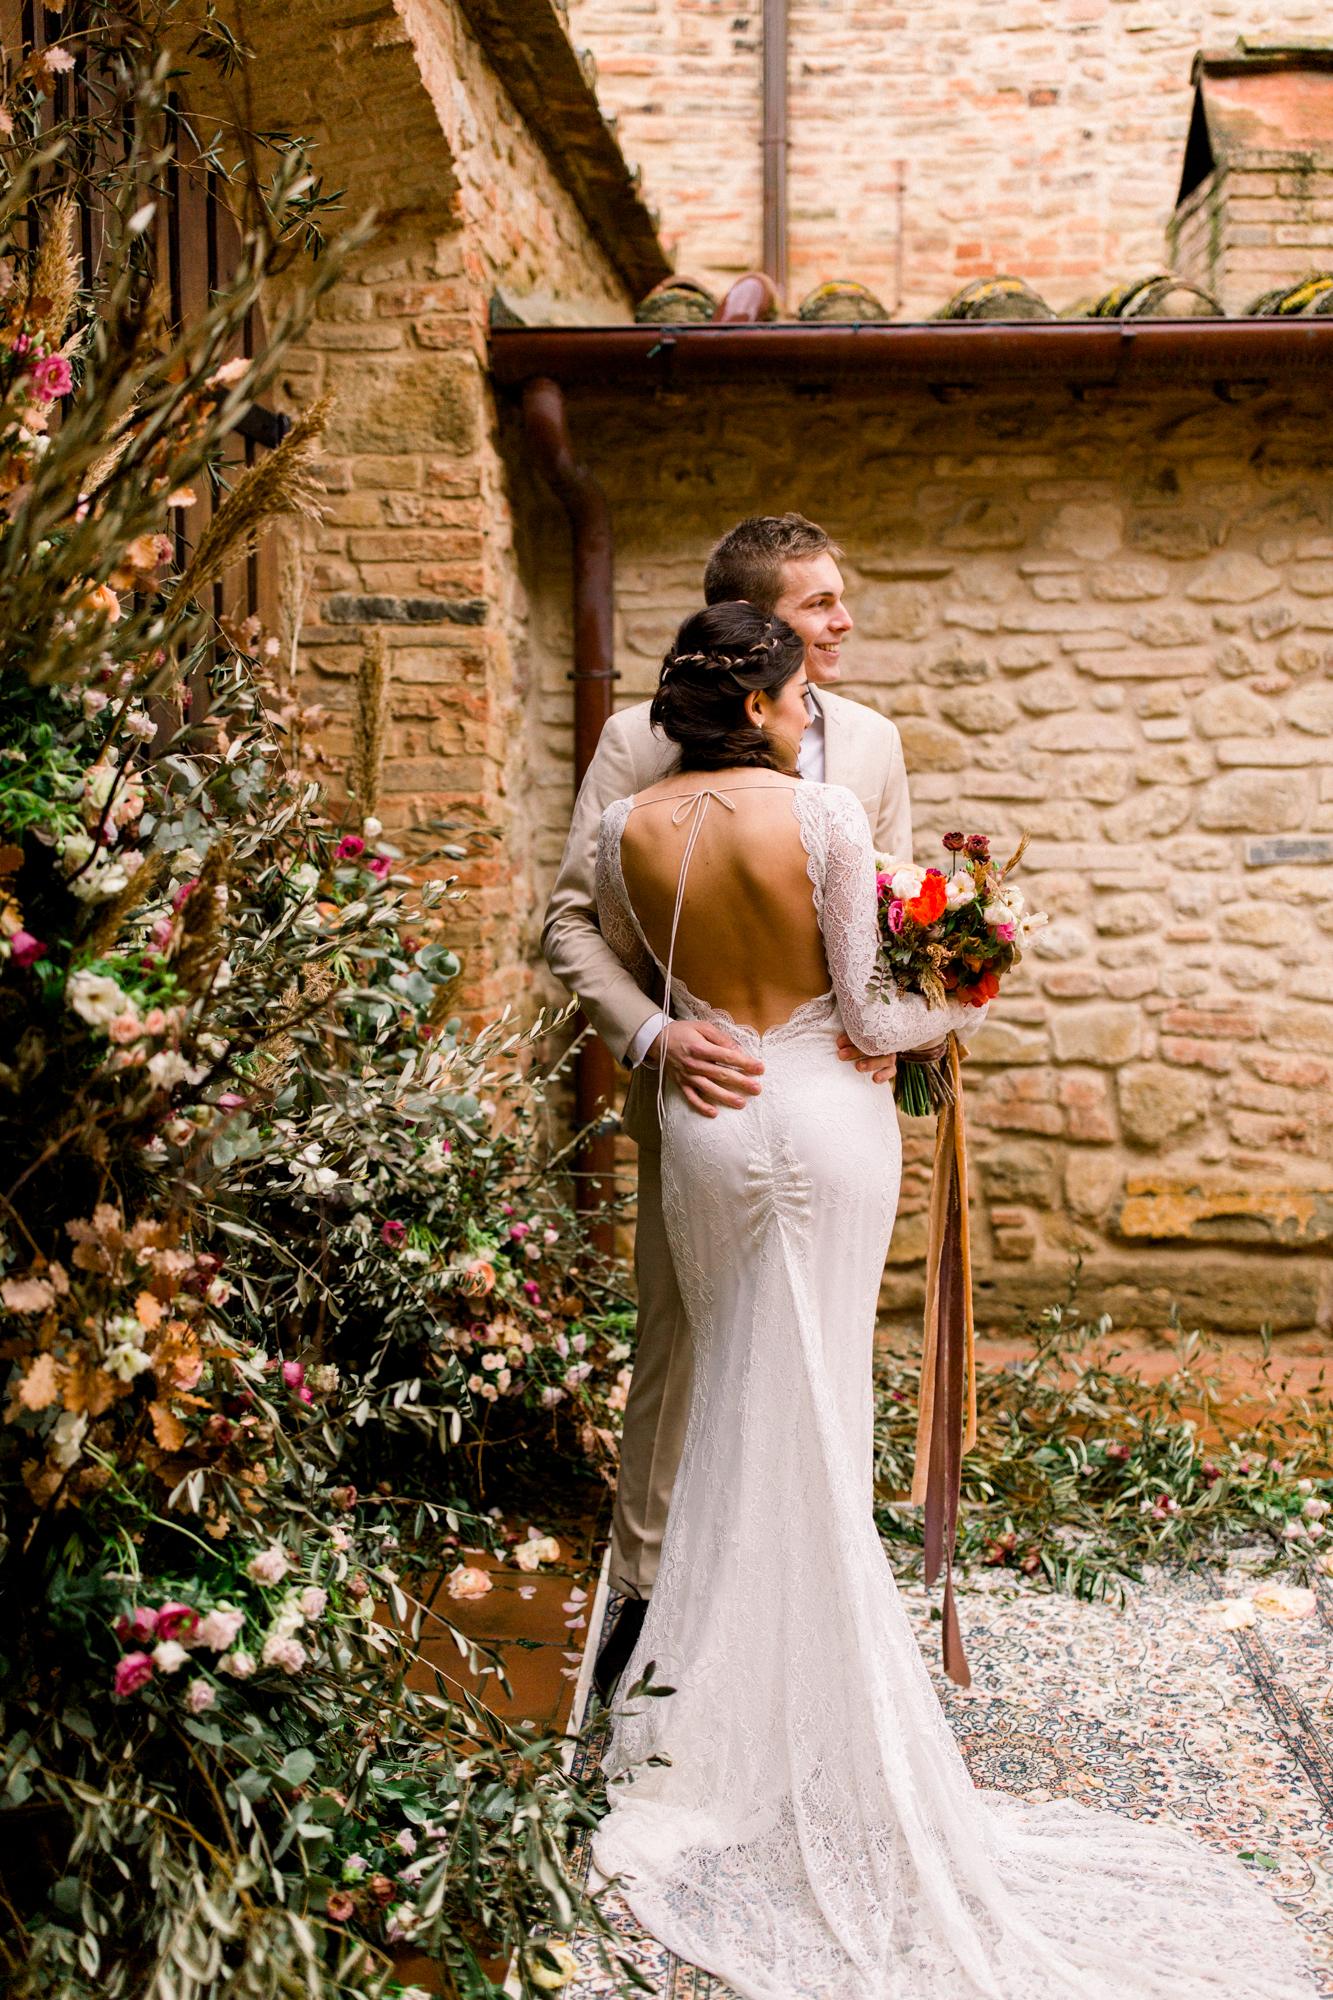 Tuscan Vespa Wedding - Britt LaShea-18.jpg